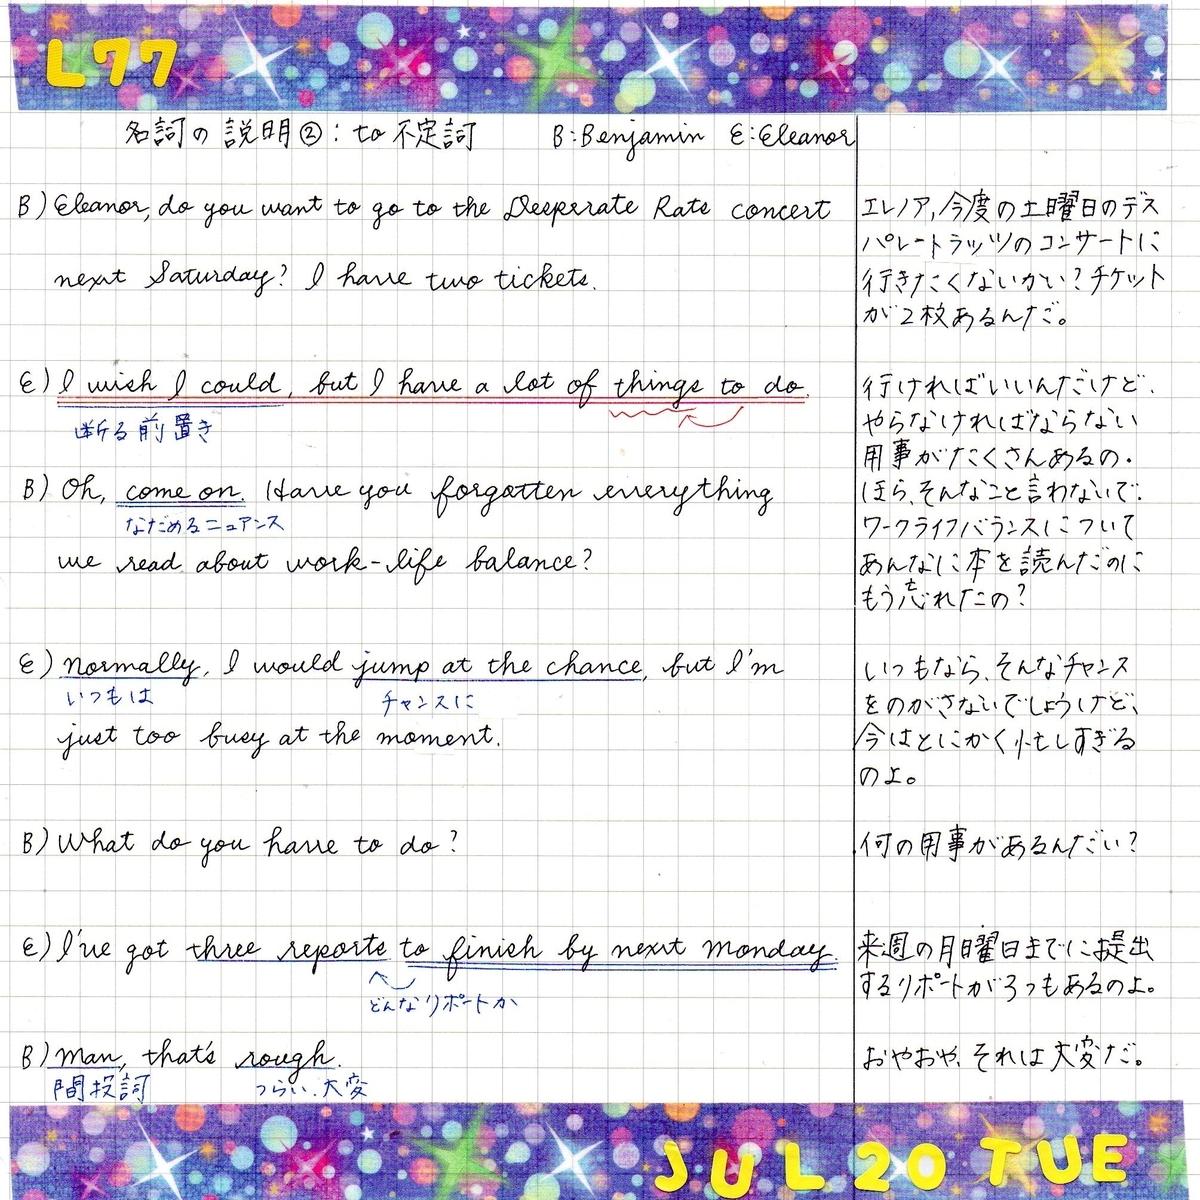 f:id:yuki-freestyle-sk8:20210728144725j:plain